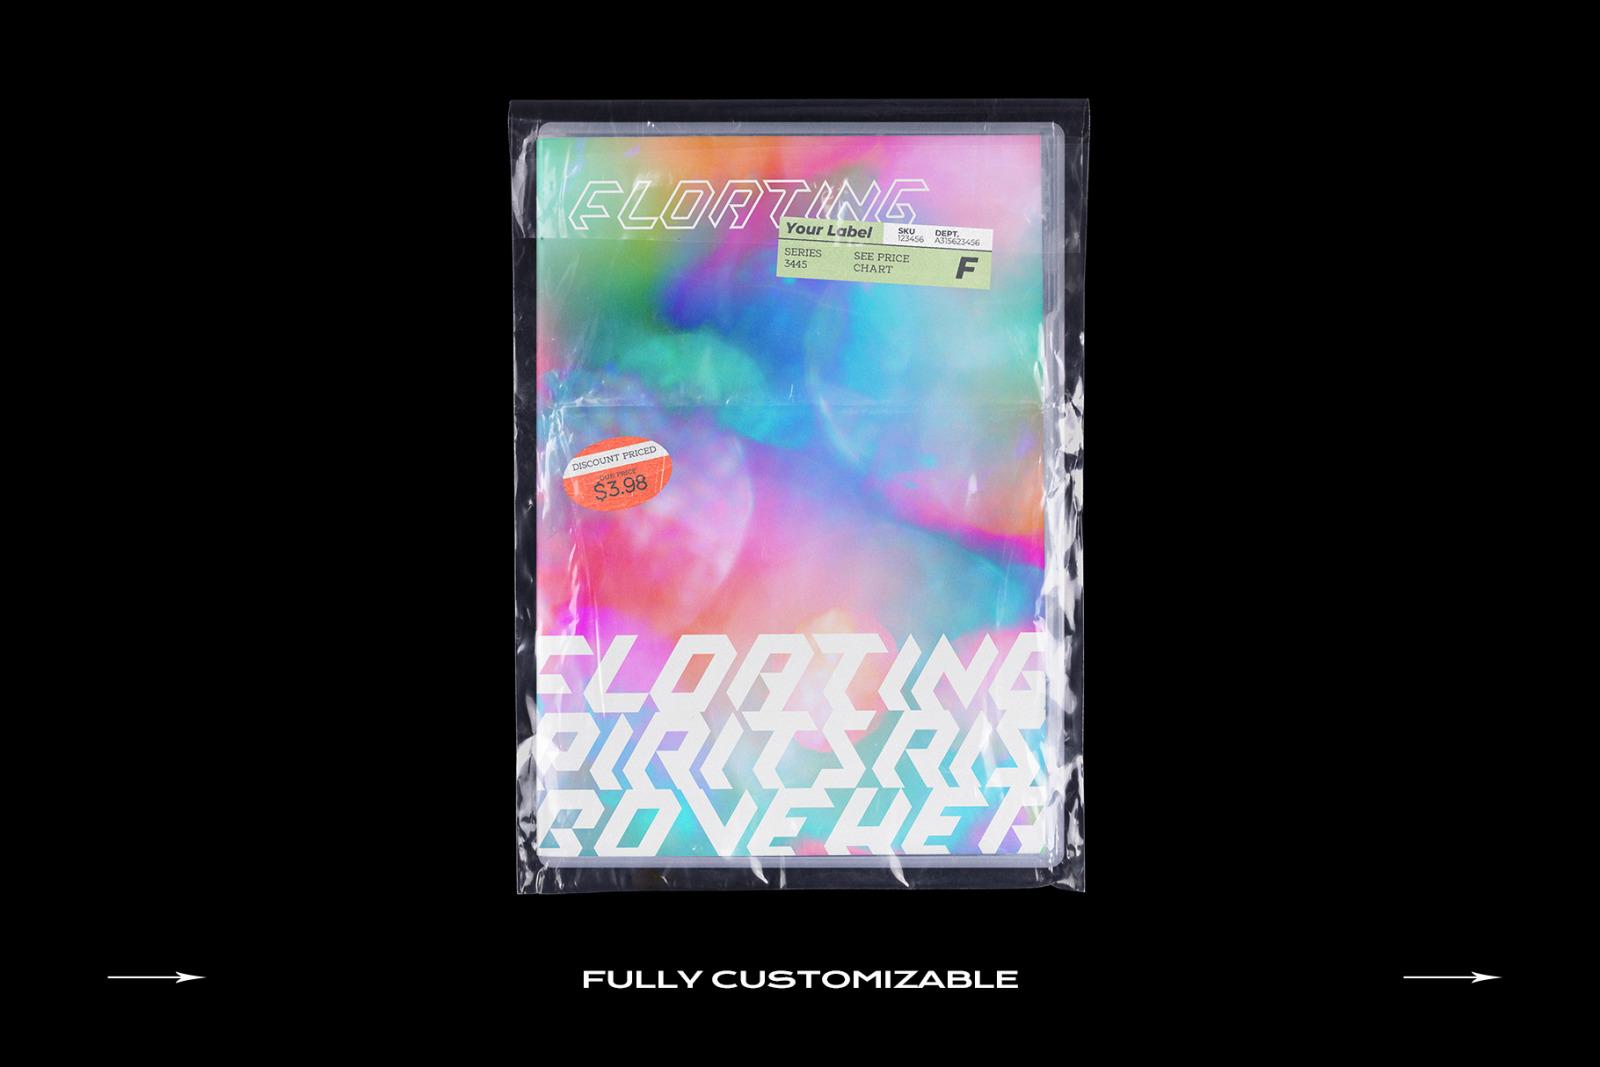 DVD Case Mockup Template Bundle Disc